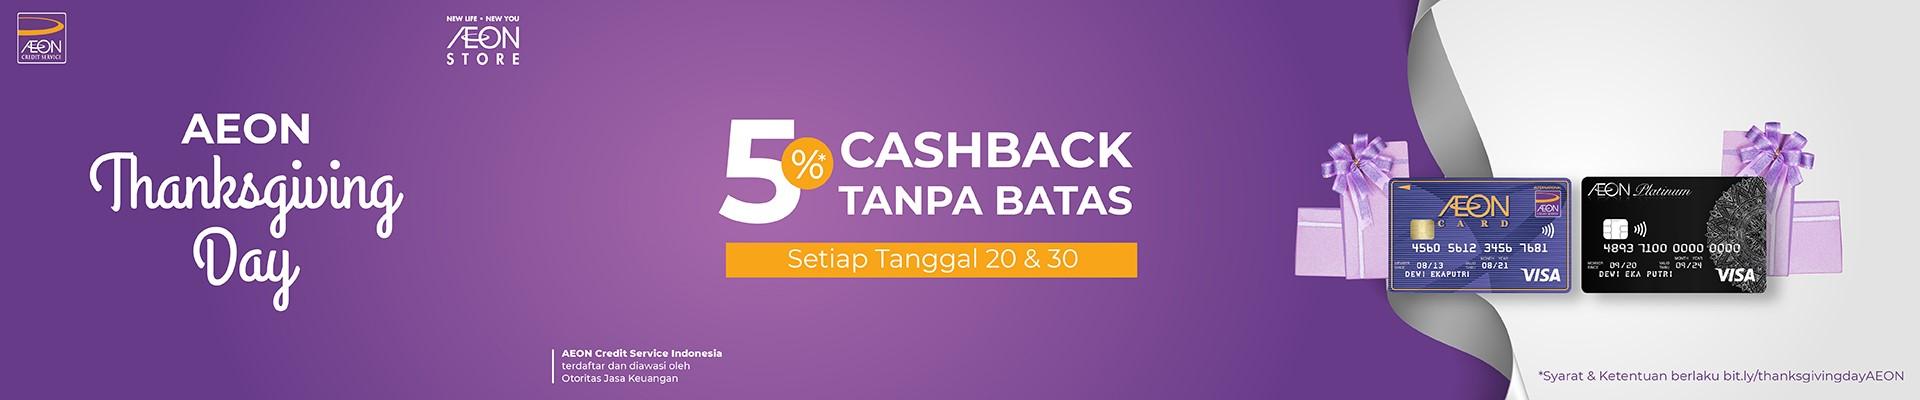 Cashback 5% & 2x Lipat Happy Point di AEON Thanksgiving Day